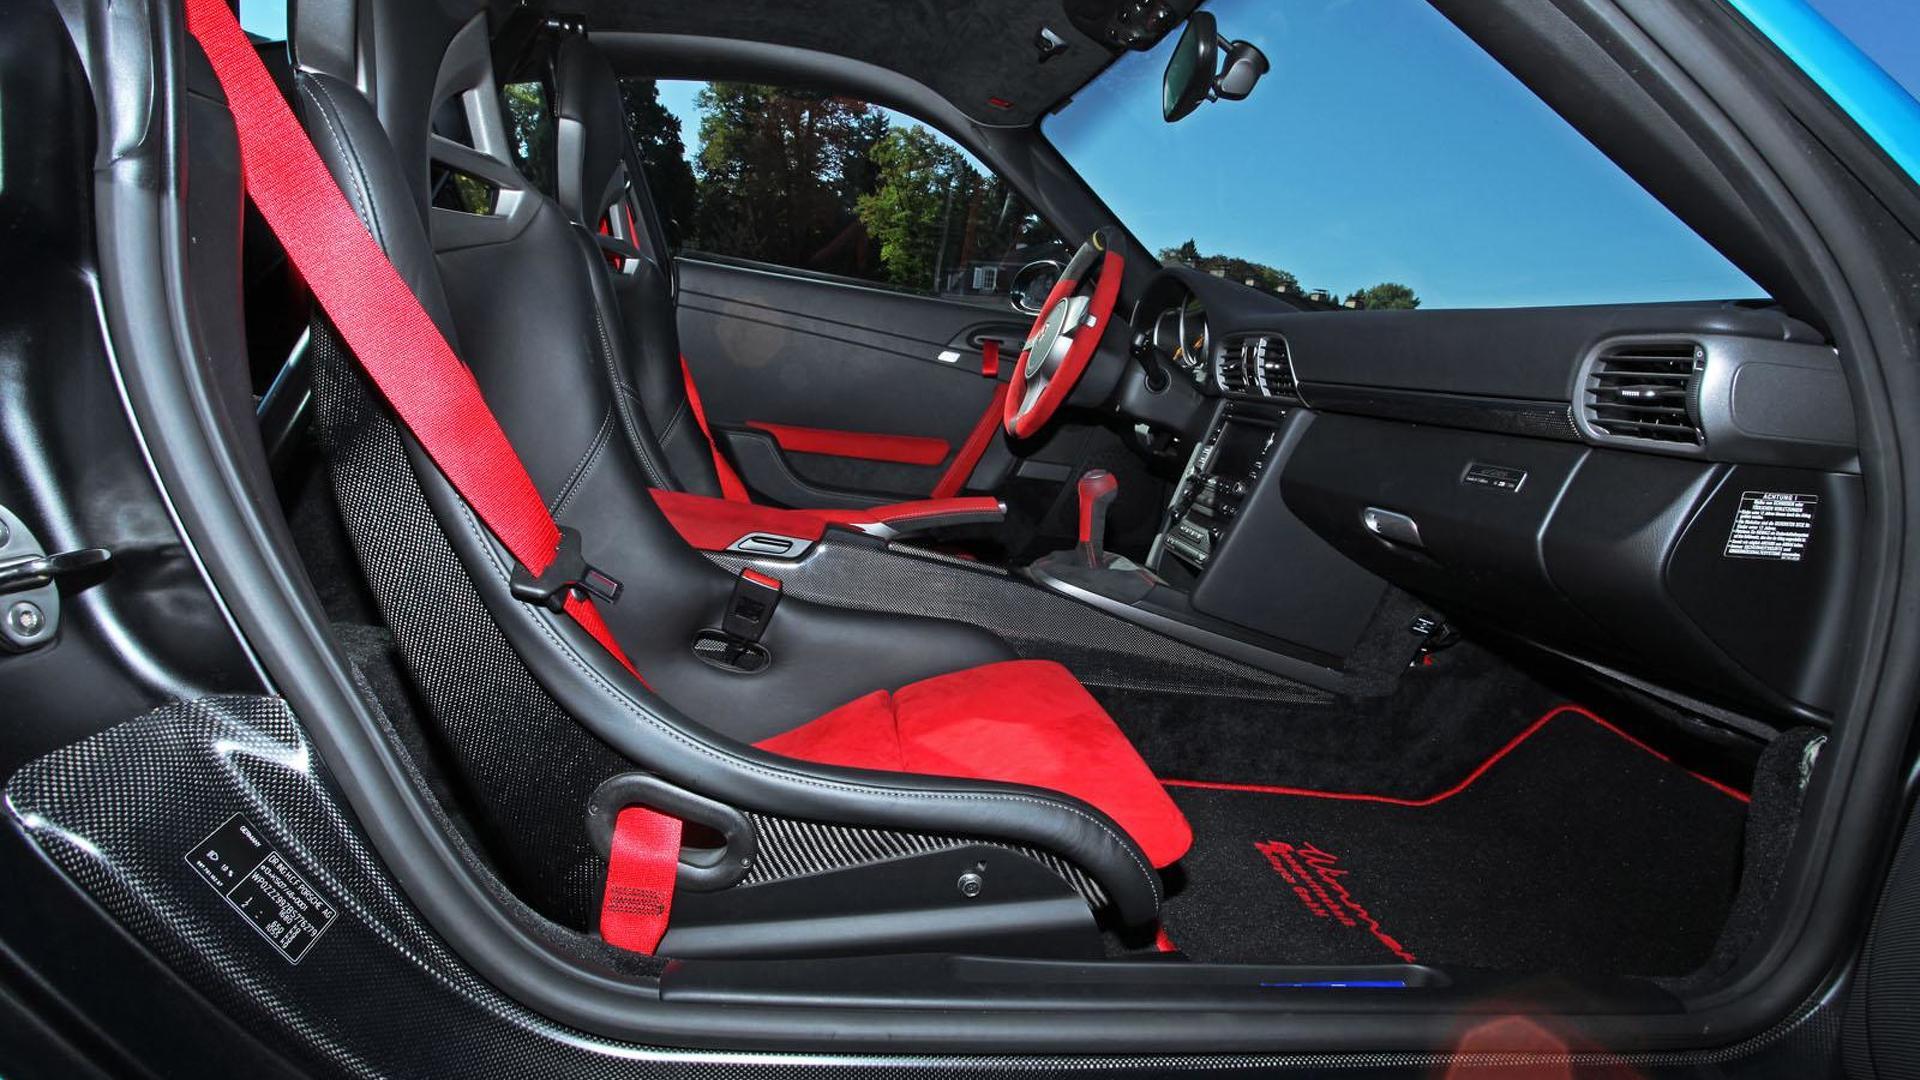 2012-340040-porsche-911-gt2-rs-muscle-play-by-wimmer-rs-23-10-20121 Astounding Porsche 911 Gt2 Rs 2012 Cars Trend